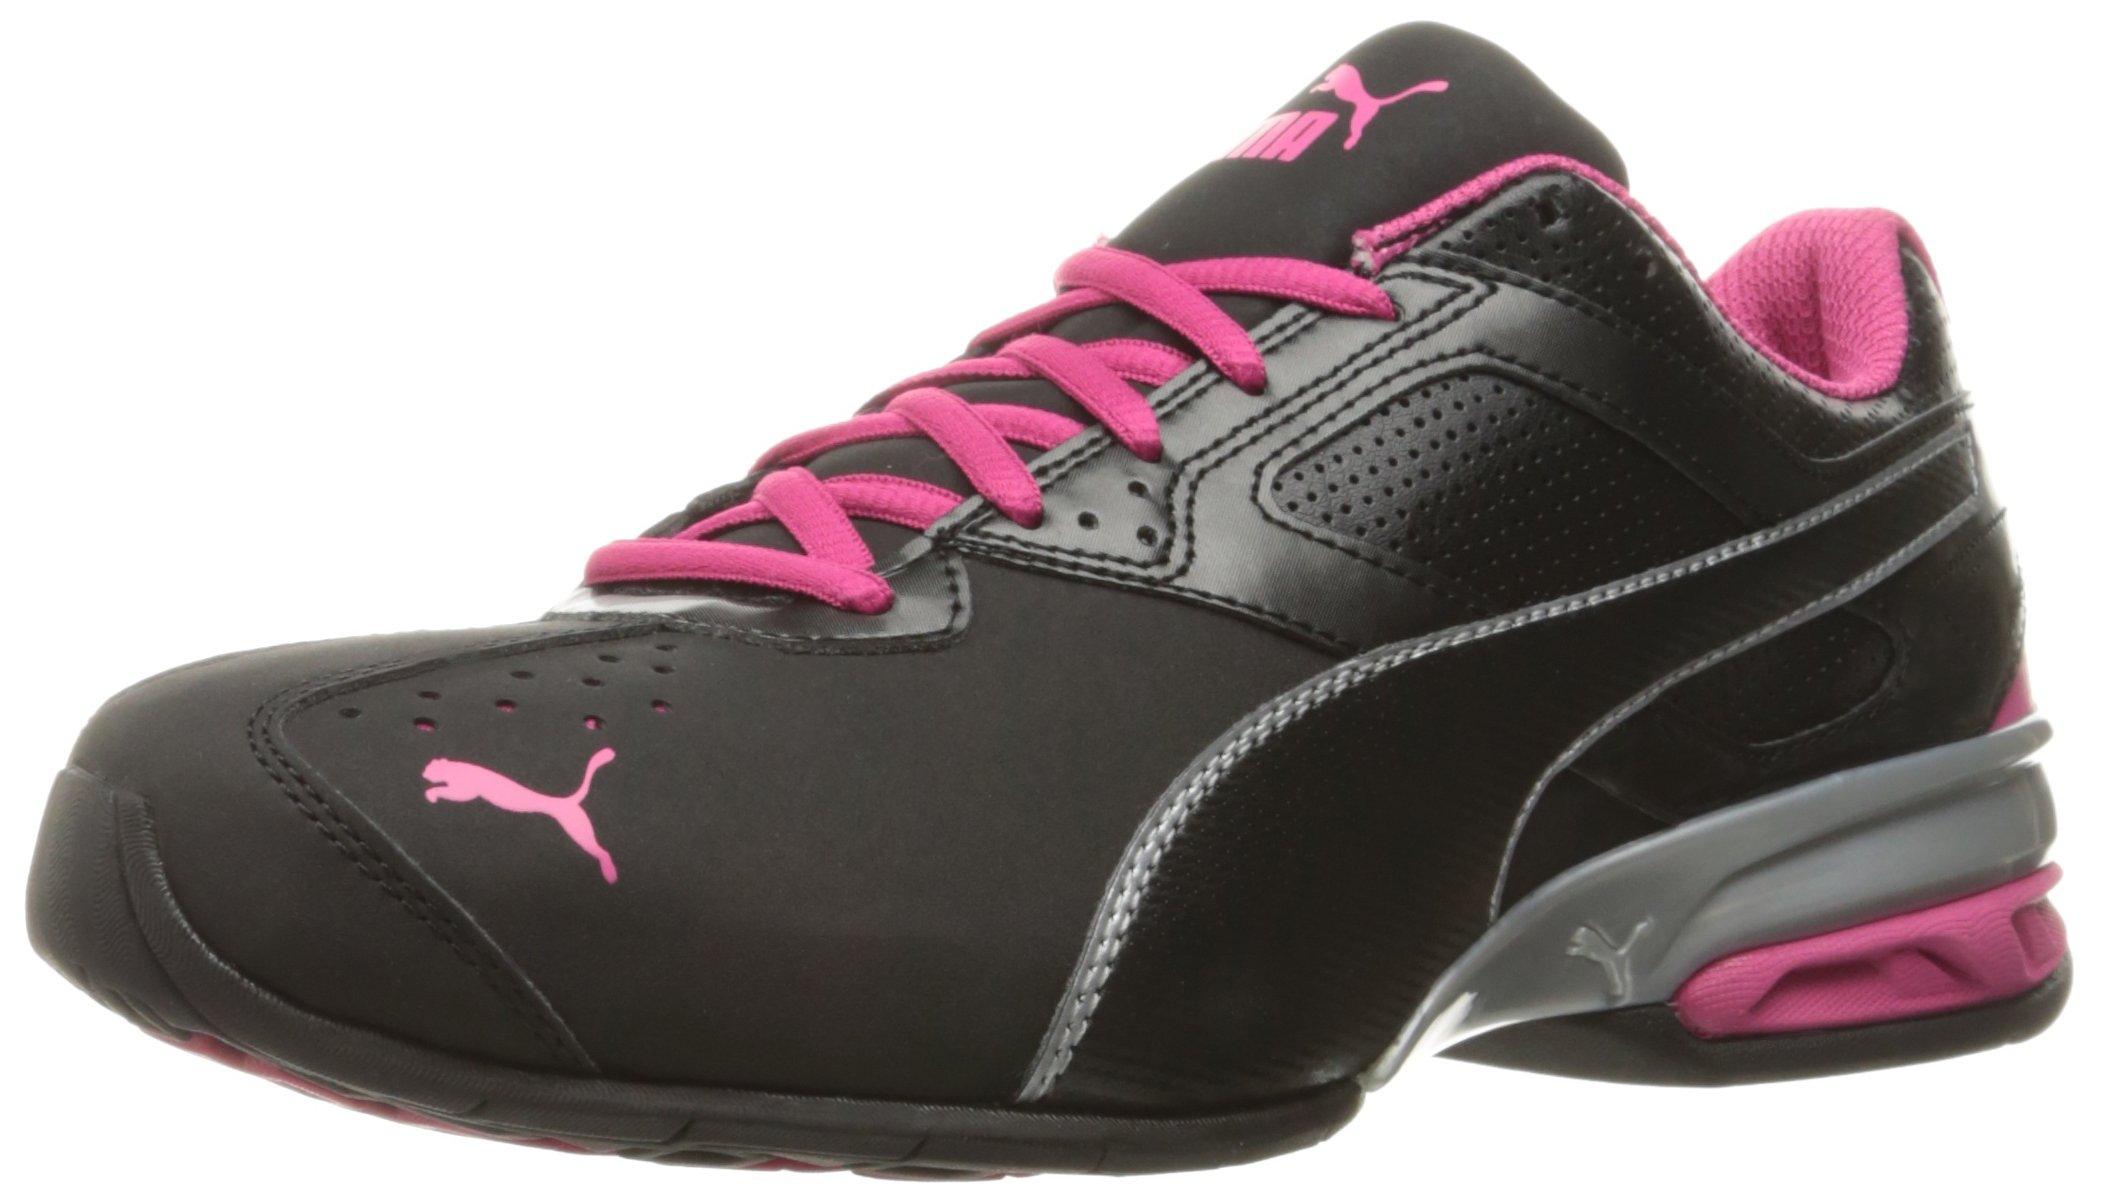 PUMA Women's Tazon 6 WN's Fm Cross-Trainer Shoe, Black Silver/Beetroot Purple, 9.5 M US